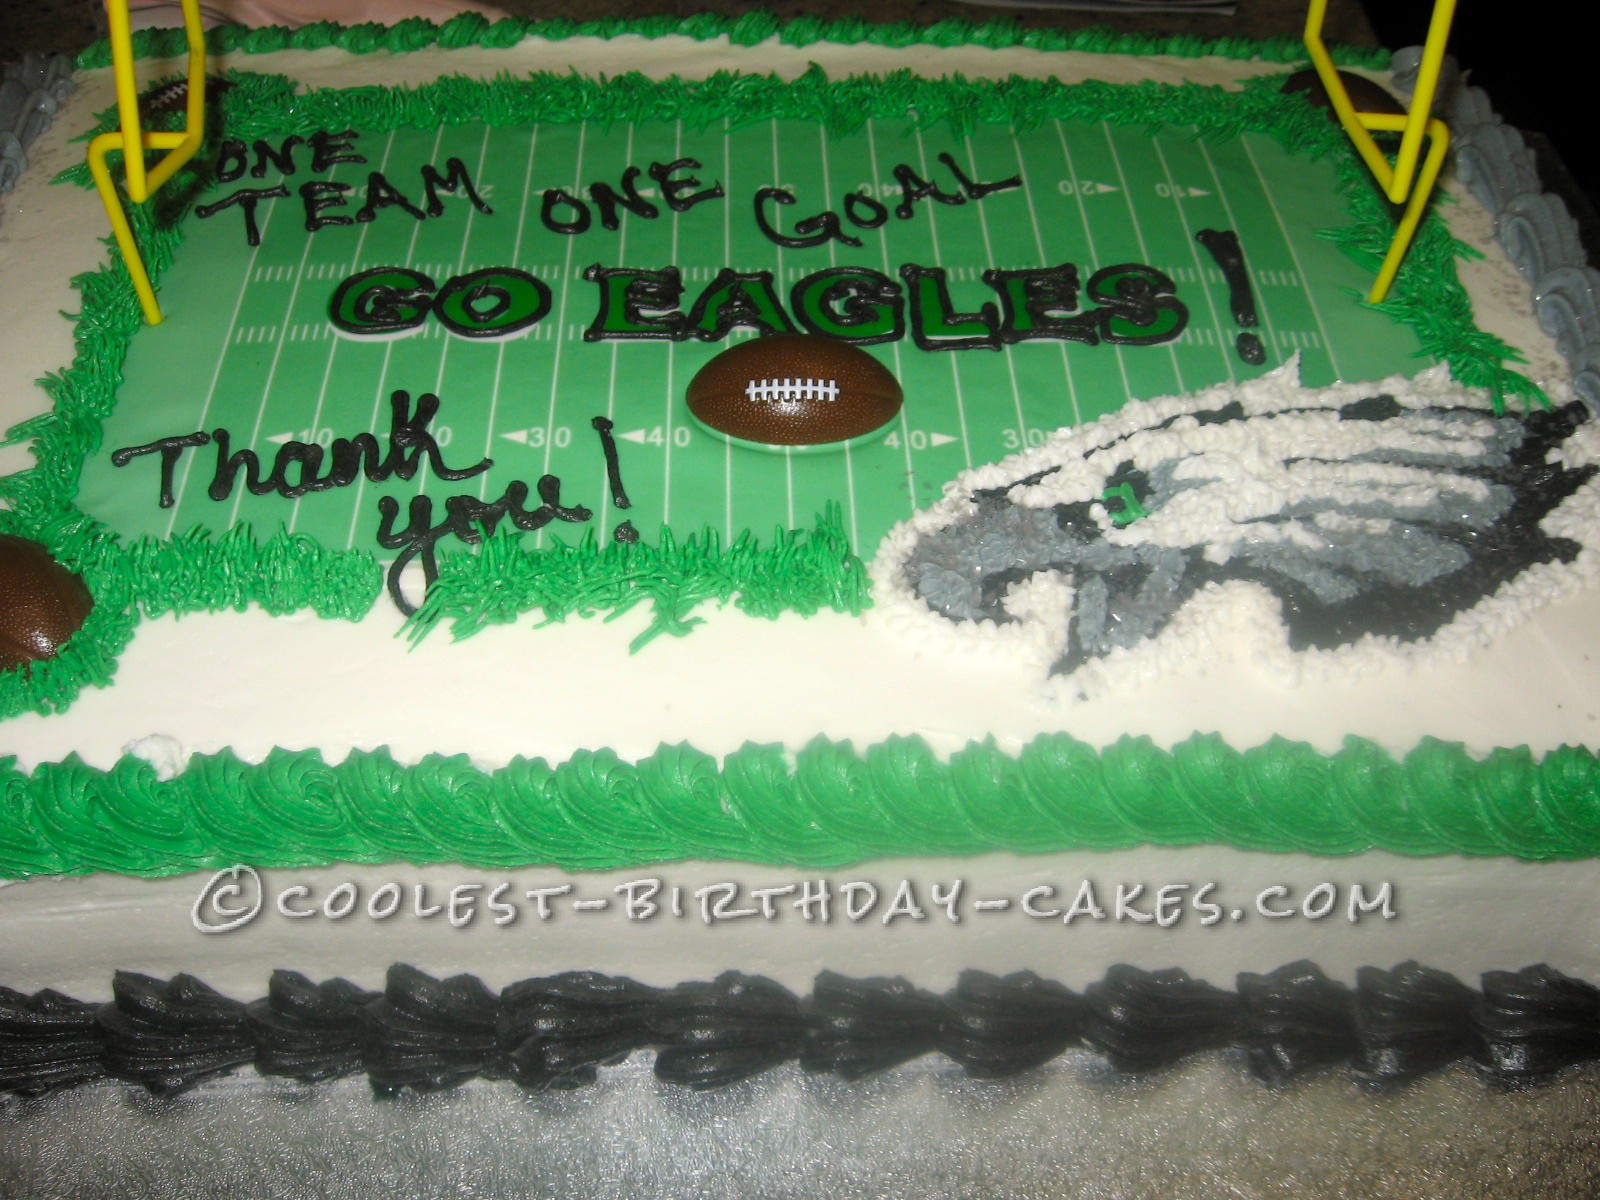 One Team One Goal, Go Eagles Cake